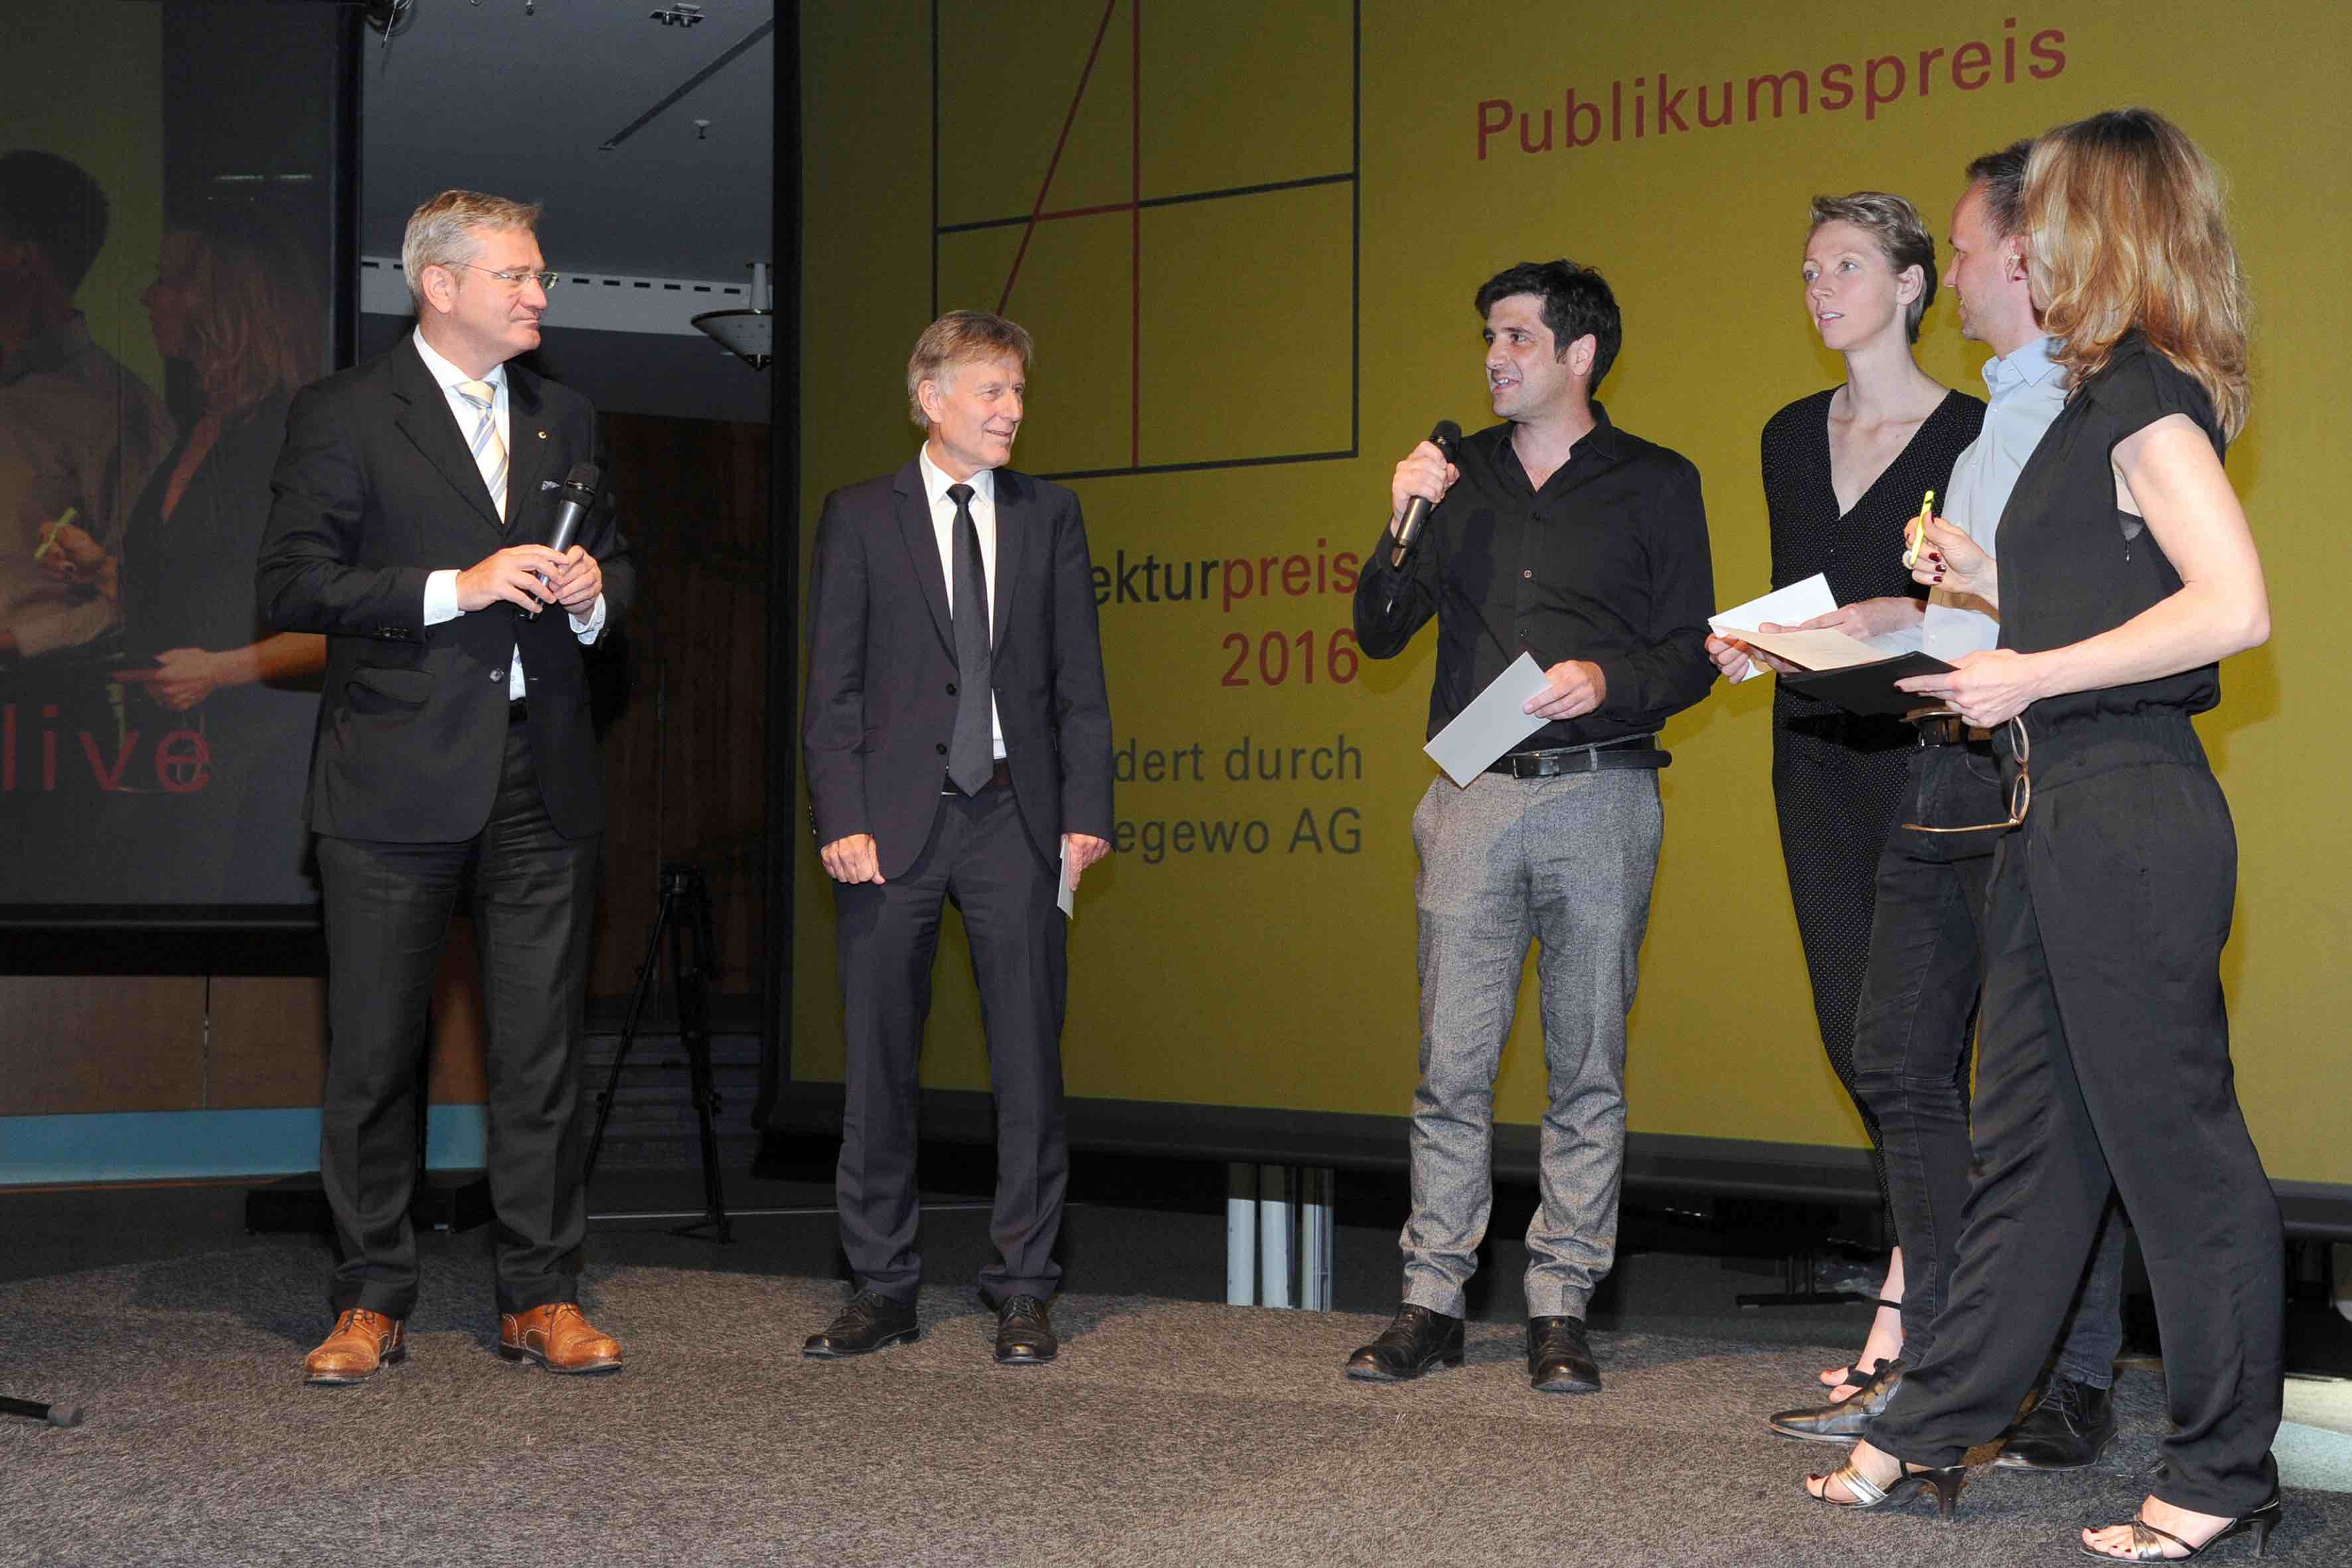 Preisverleihung Architekturpreis Berlin 2016